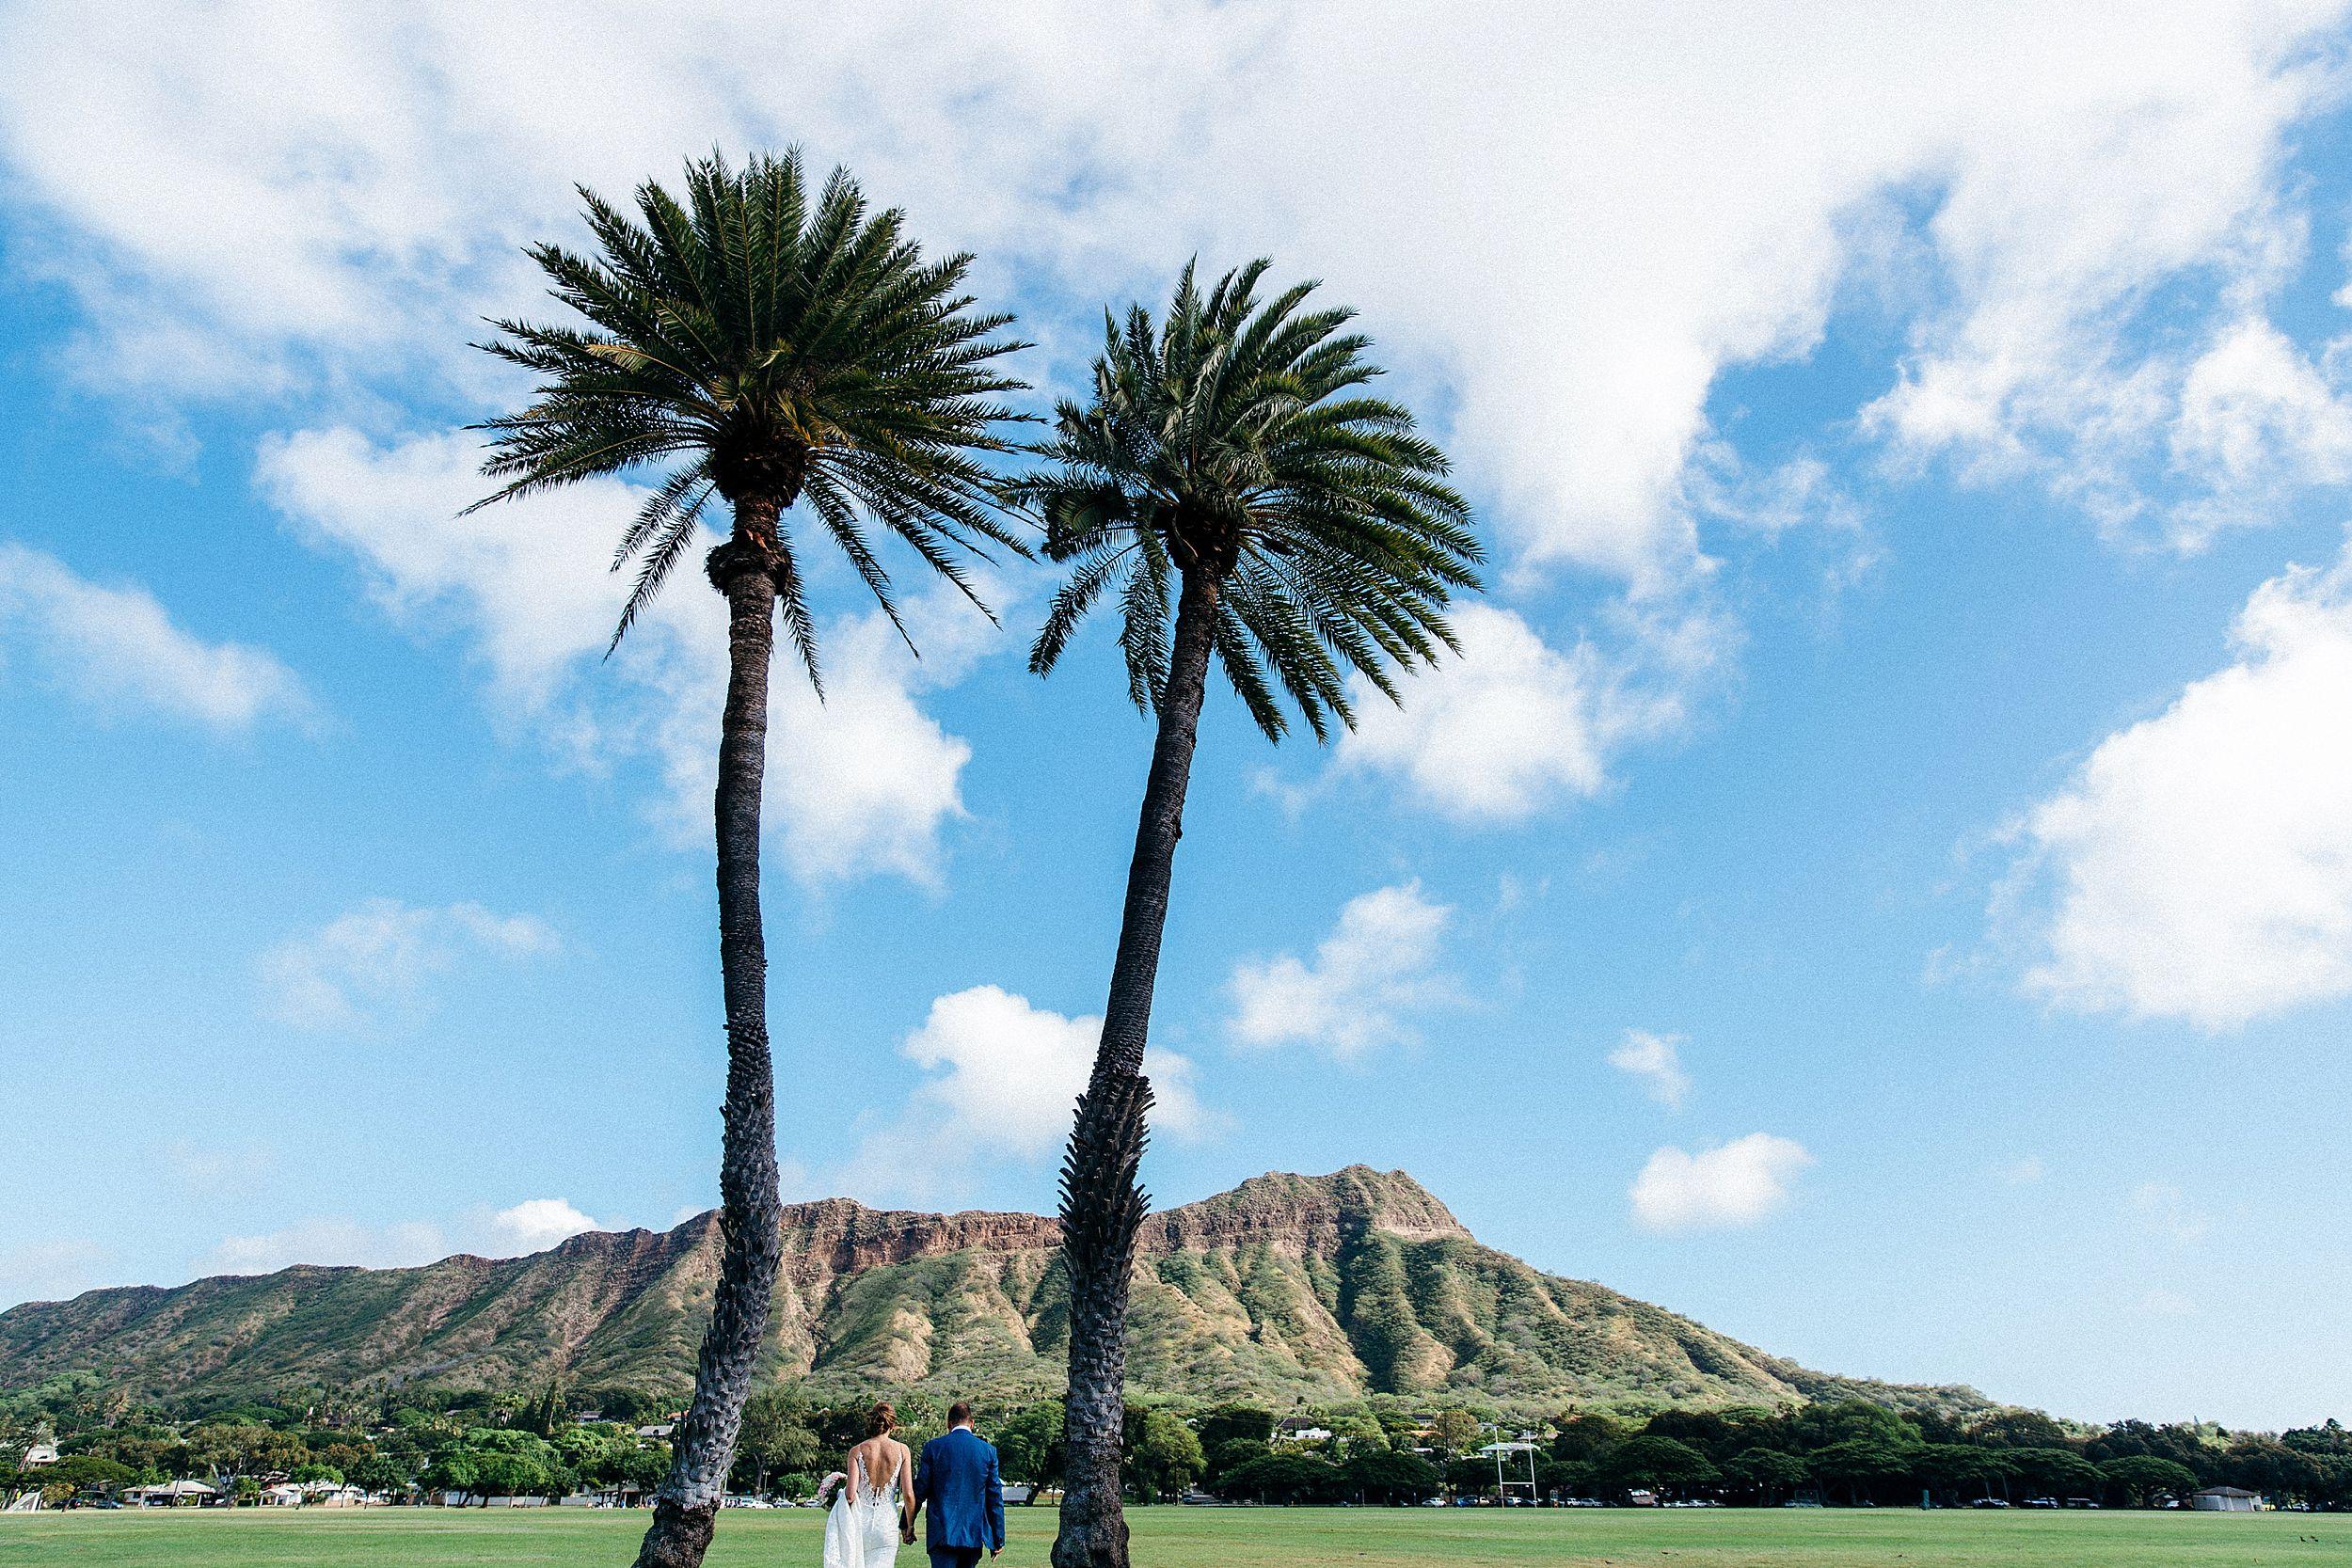 Wedding portraits at Diamond Head near Waikiki, Honolulu, Hawaii - Hannah & Matthew's small, personal elopement